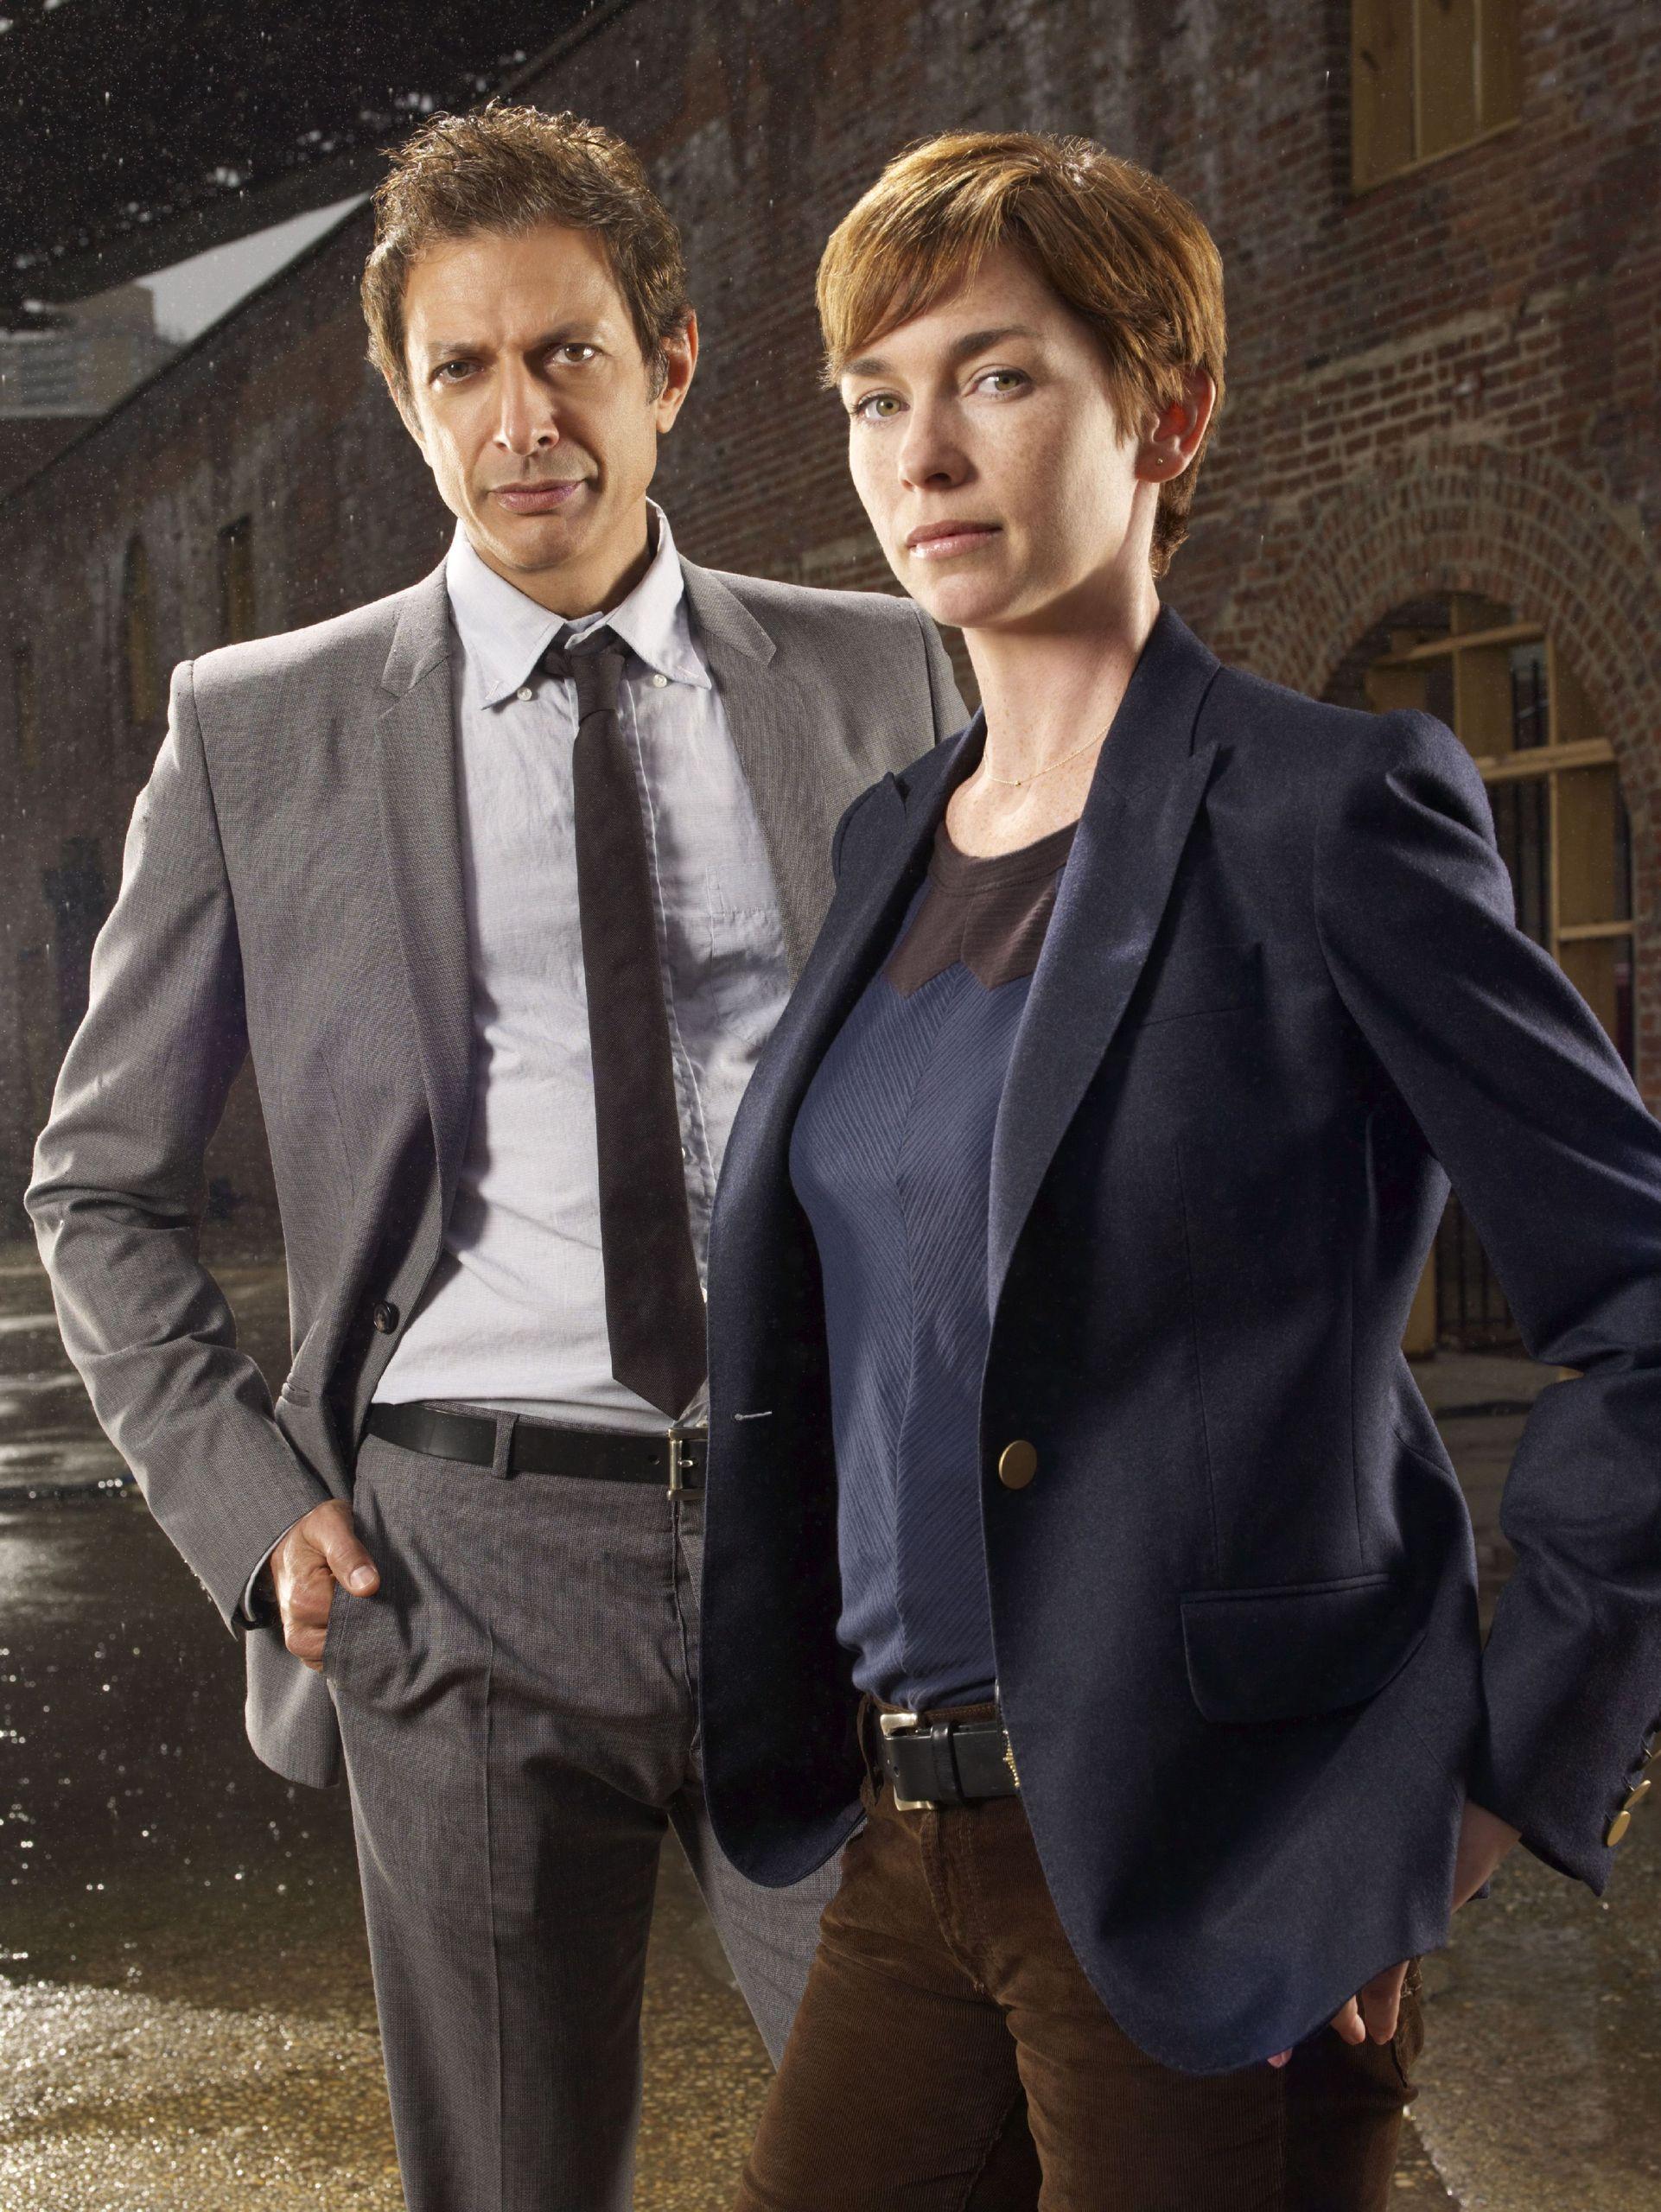 Season 8 cast promo law and order ci 2580504 1922 2560 jpg